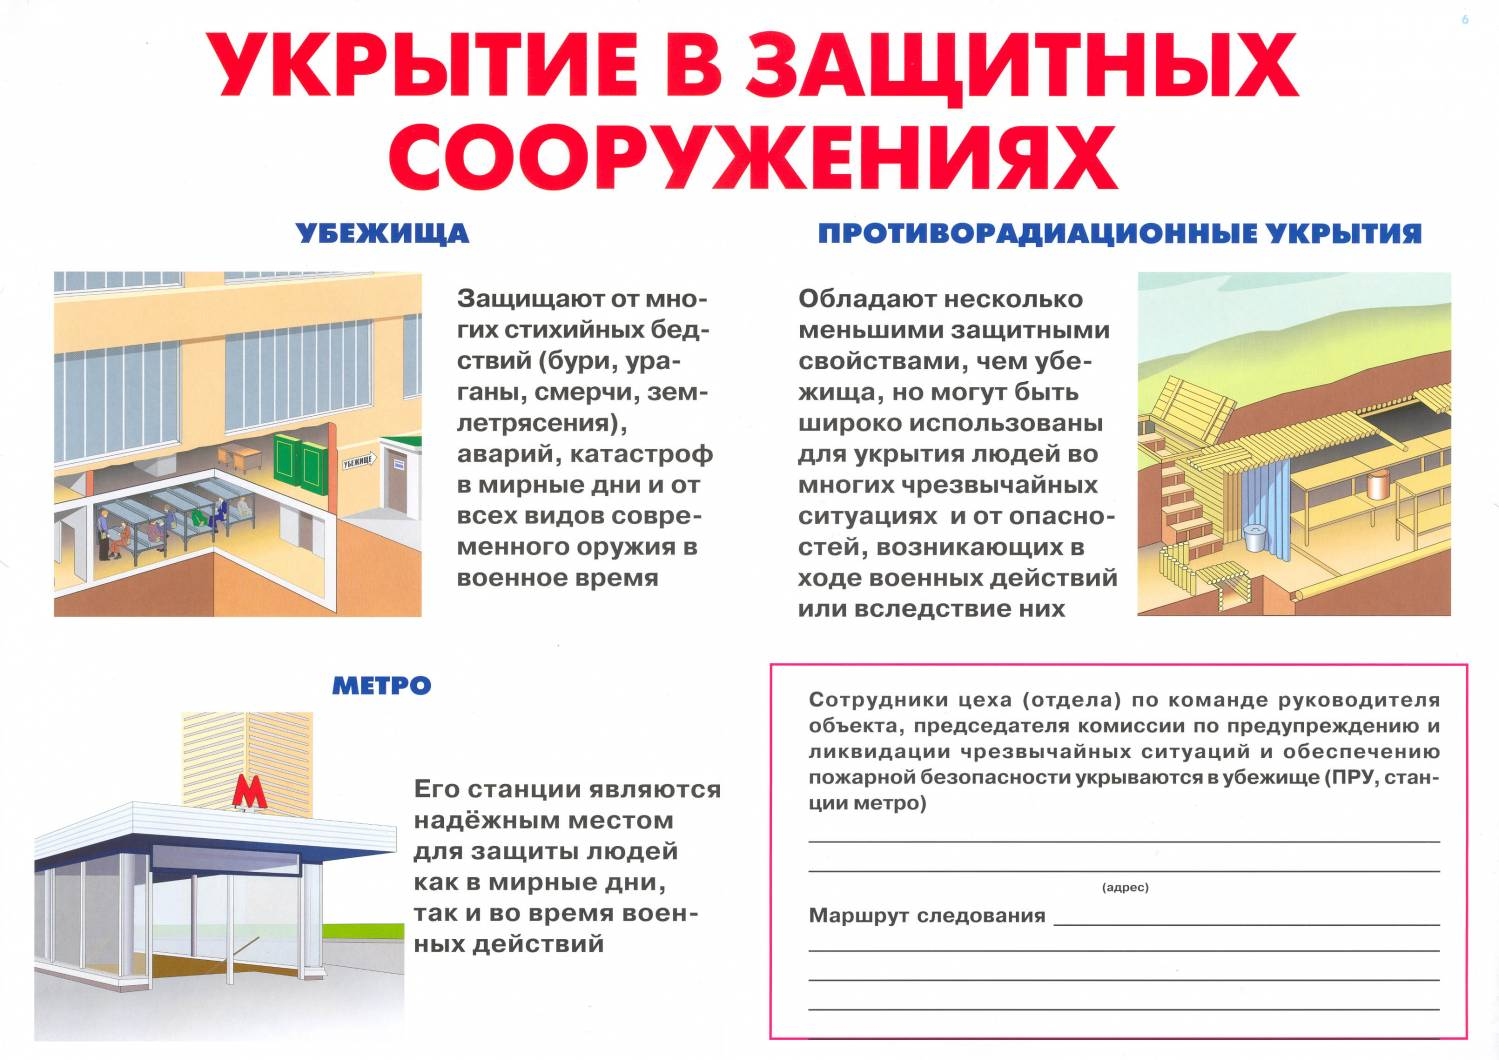 http://novospasskoe.do.am/_nw/2/08694865.jpg